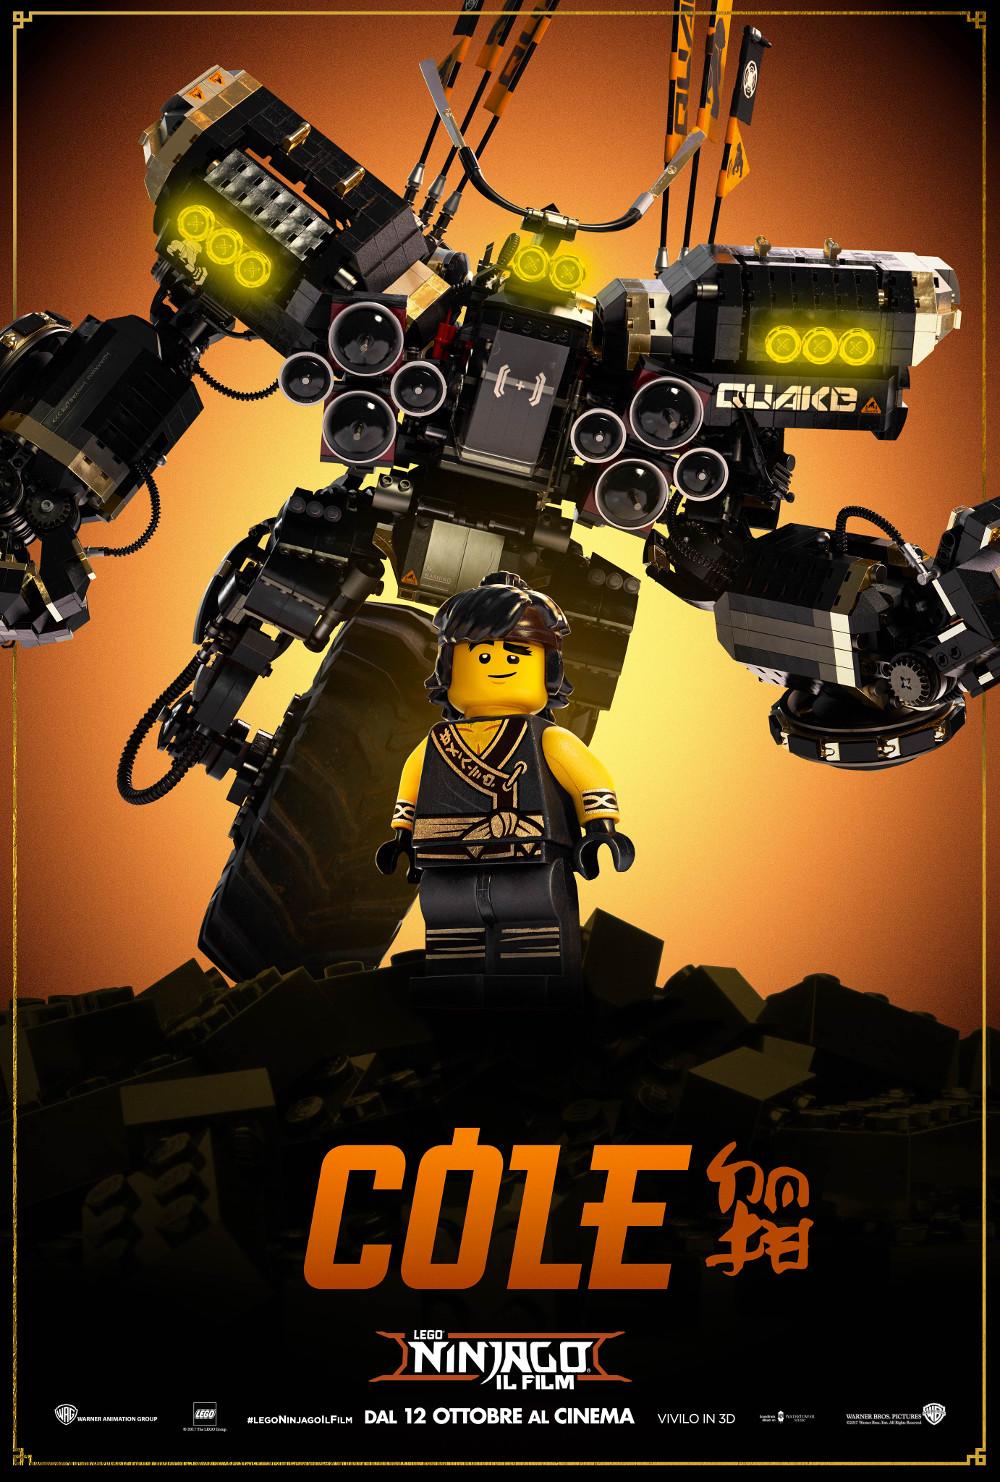 Movie Poster jackie chan movie poster : LEGO NINJAGO IL FILM - I Mech Character Poster Italiani